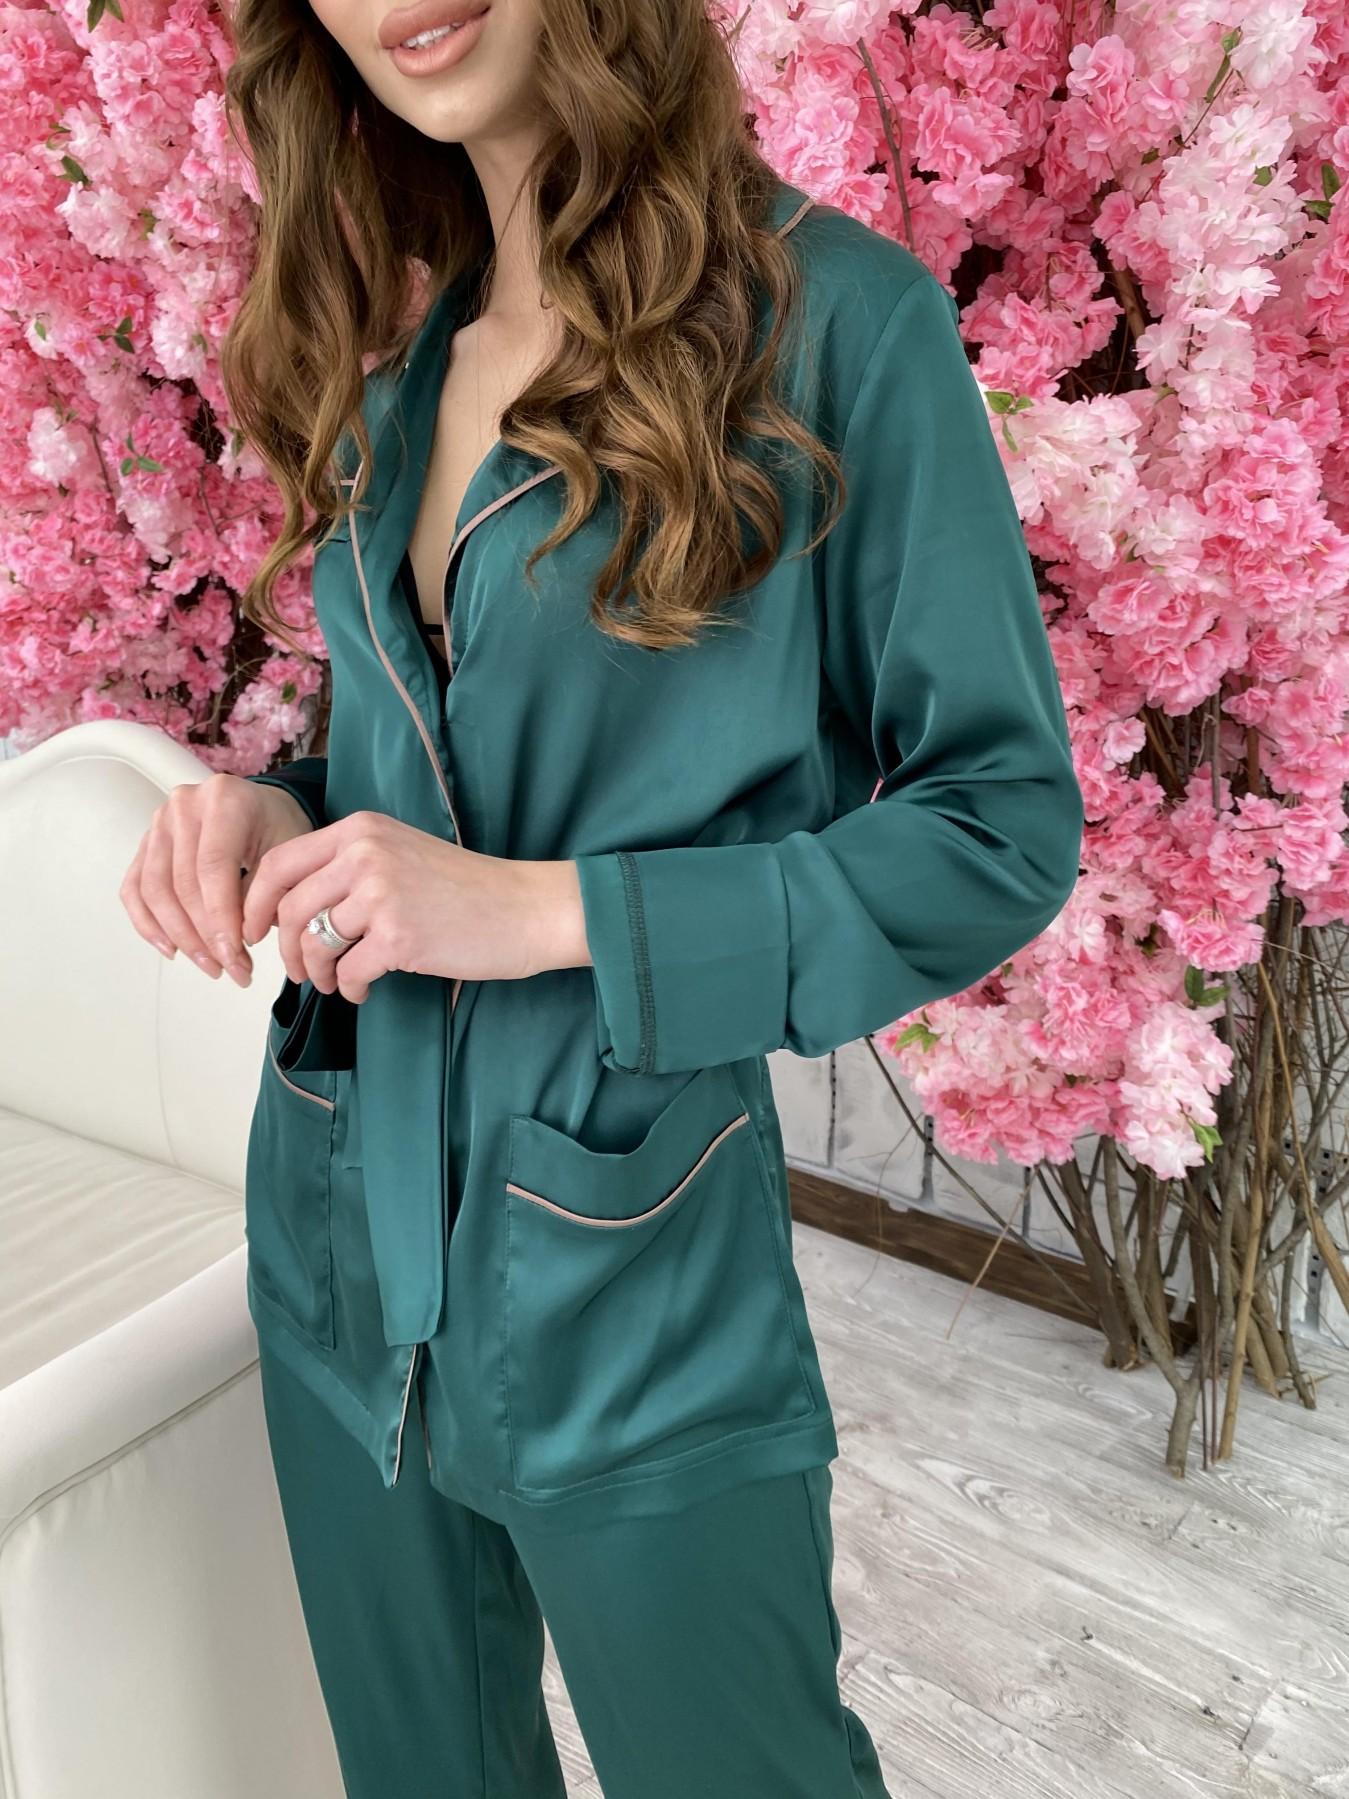 Шайн костюм из шелка  10778 АРТ. 47212 Цвет: Темно зеленый - фото 7, интернет магазин tm-modus.ru